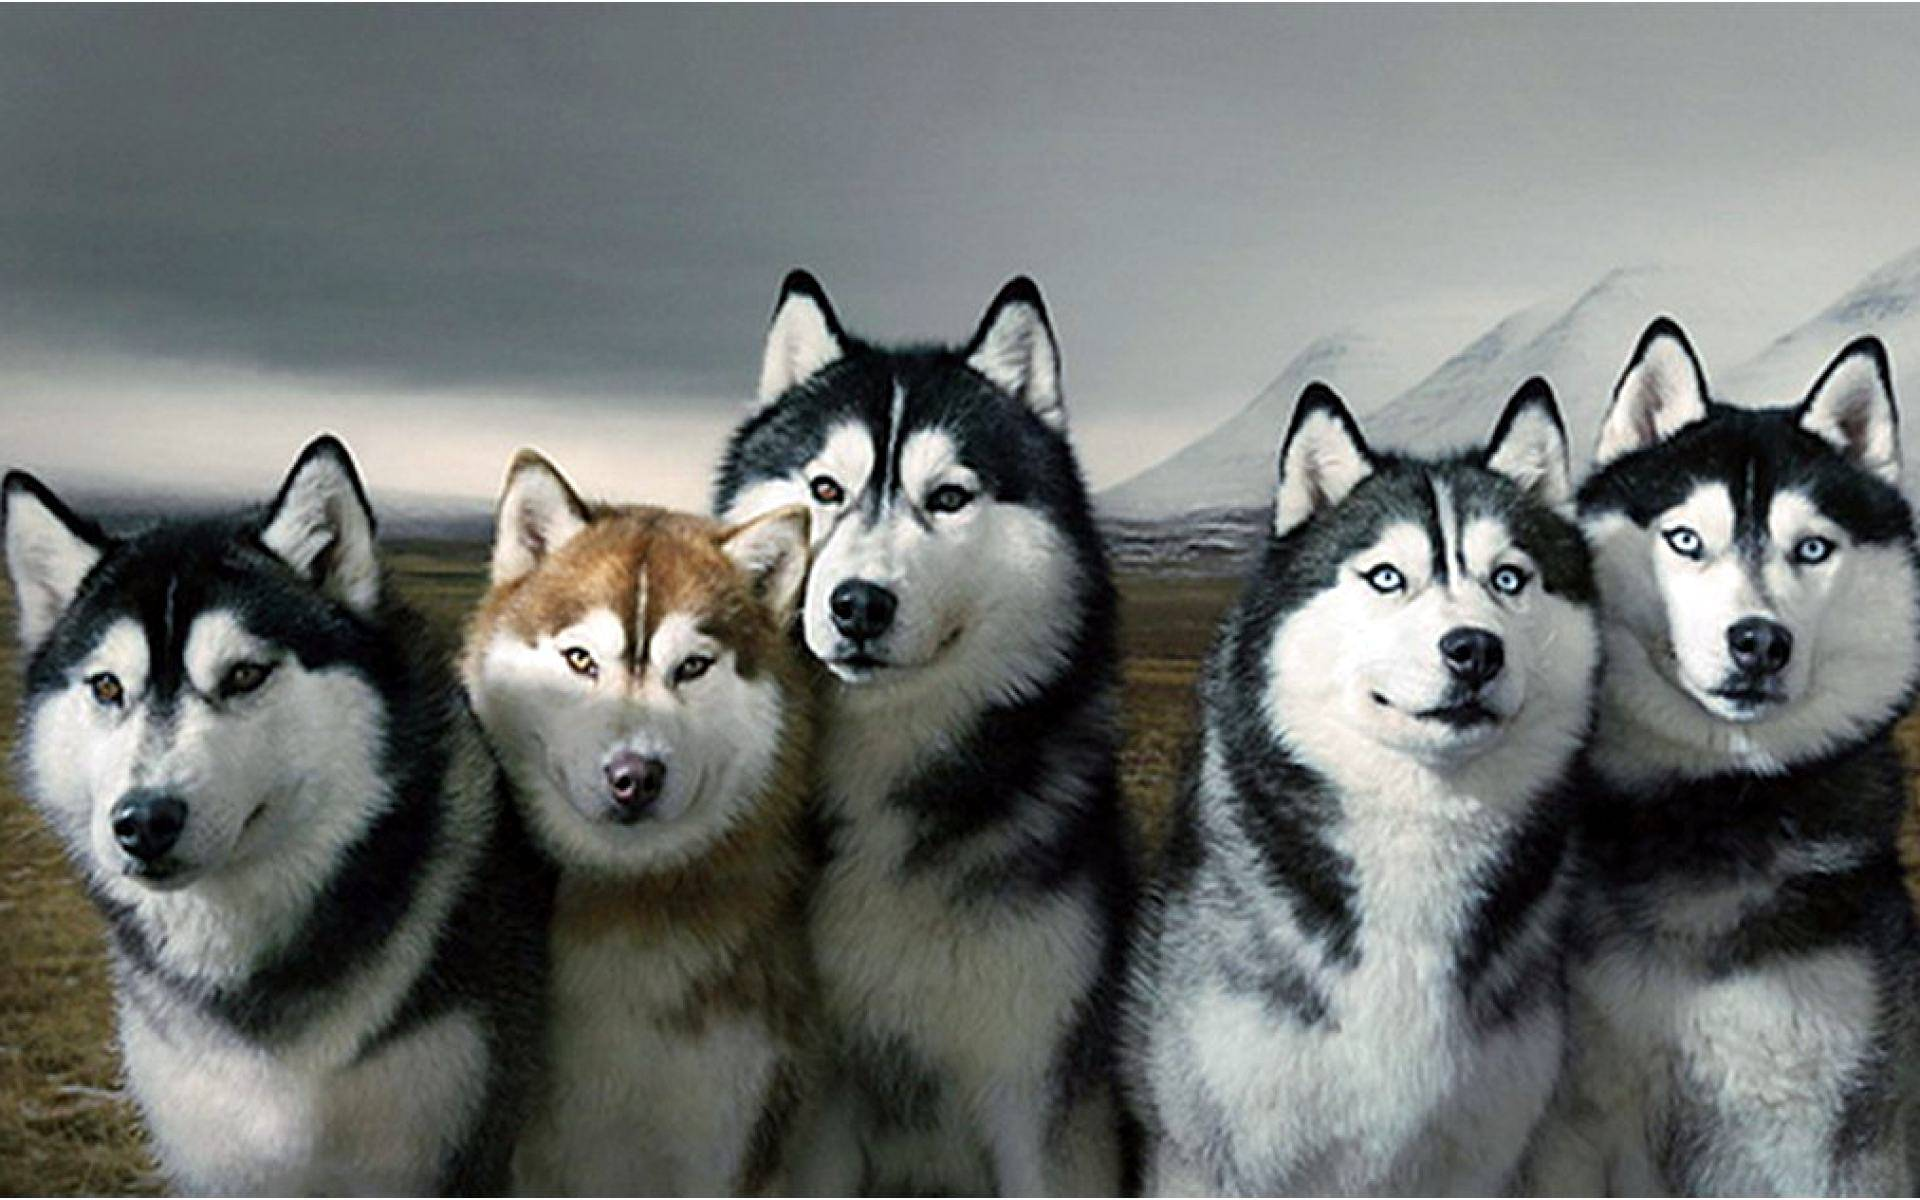 Husky Dog Wallpapers Wallpaper Cave